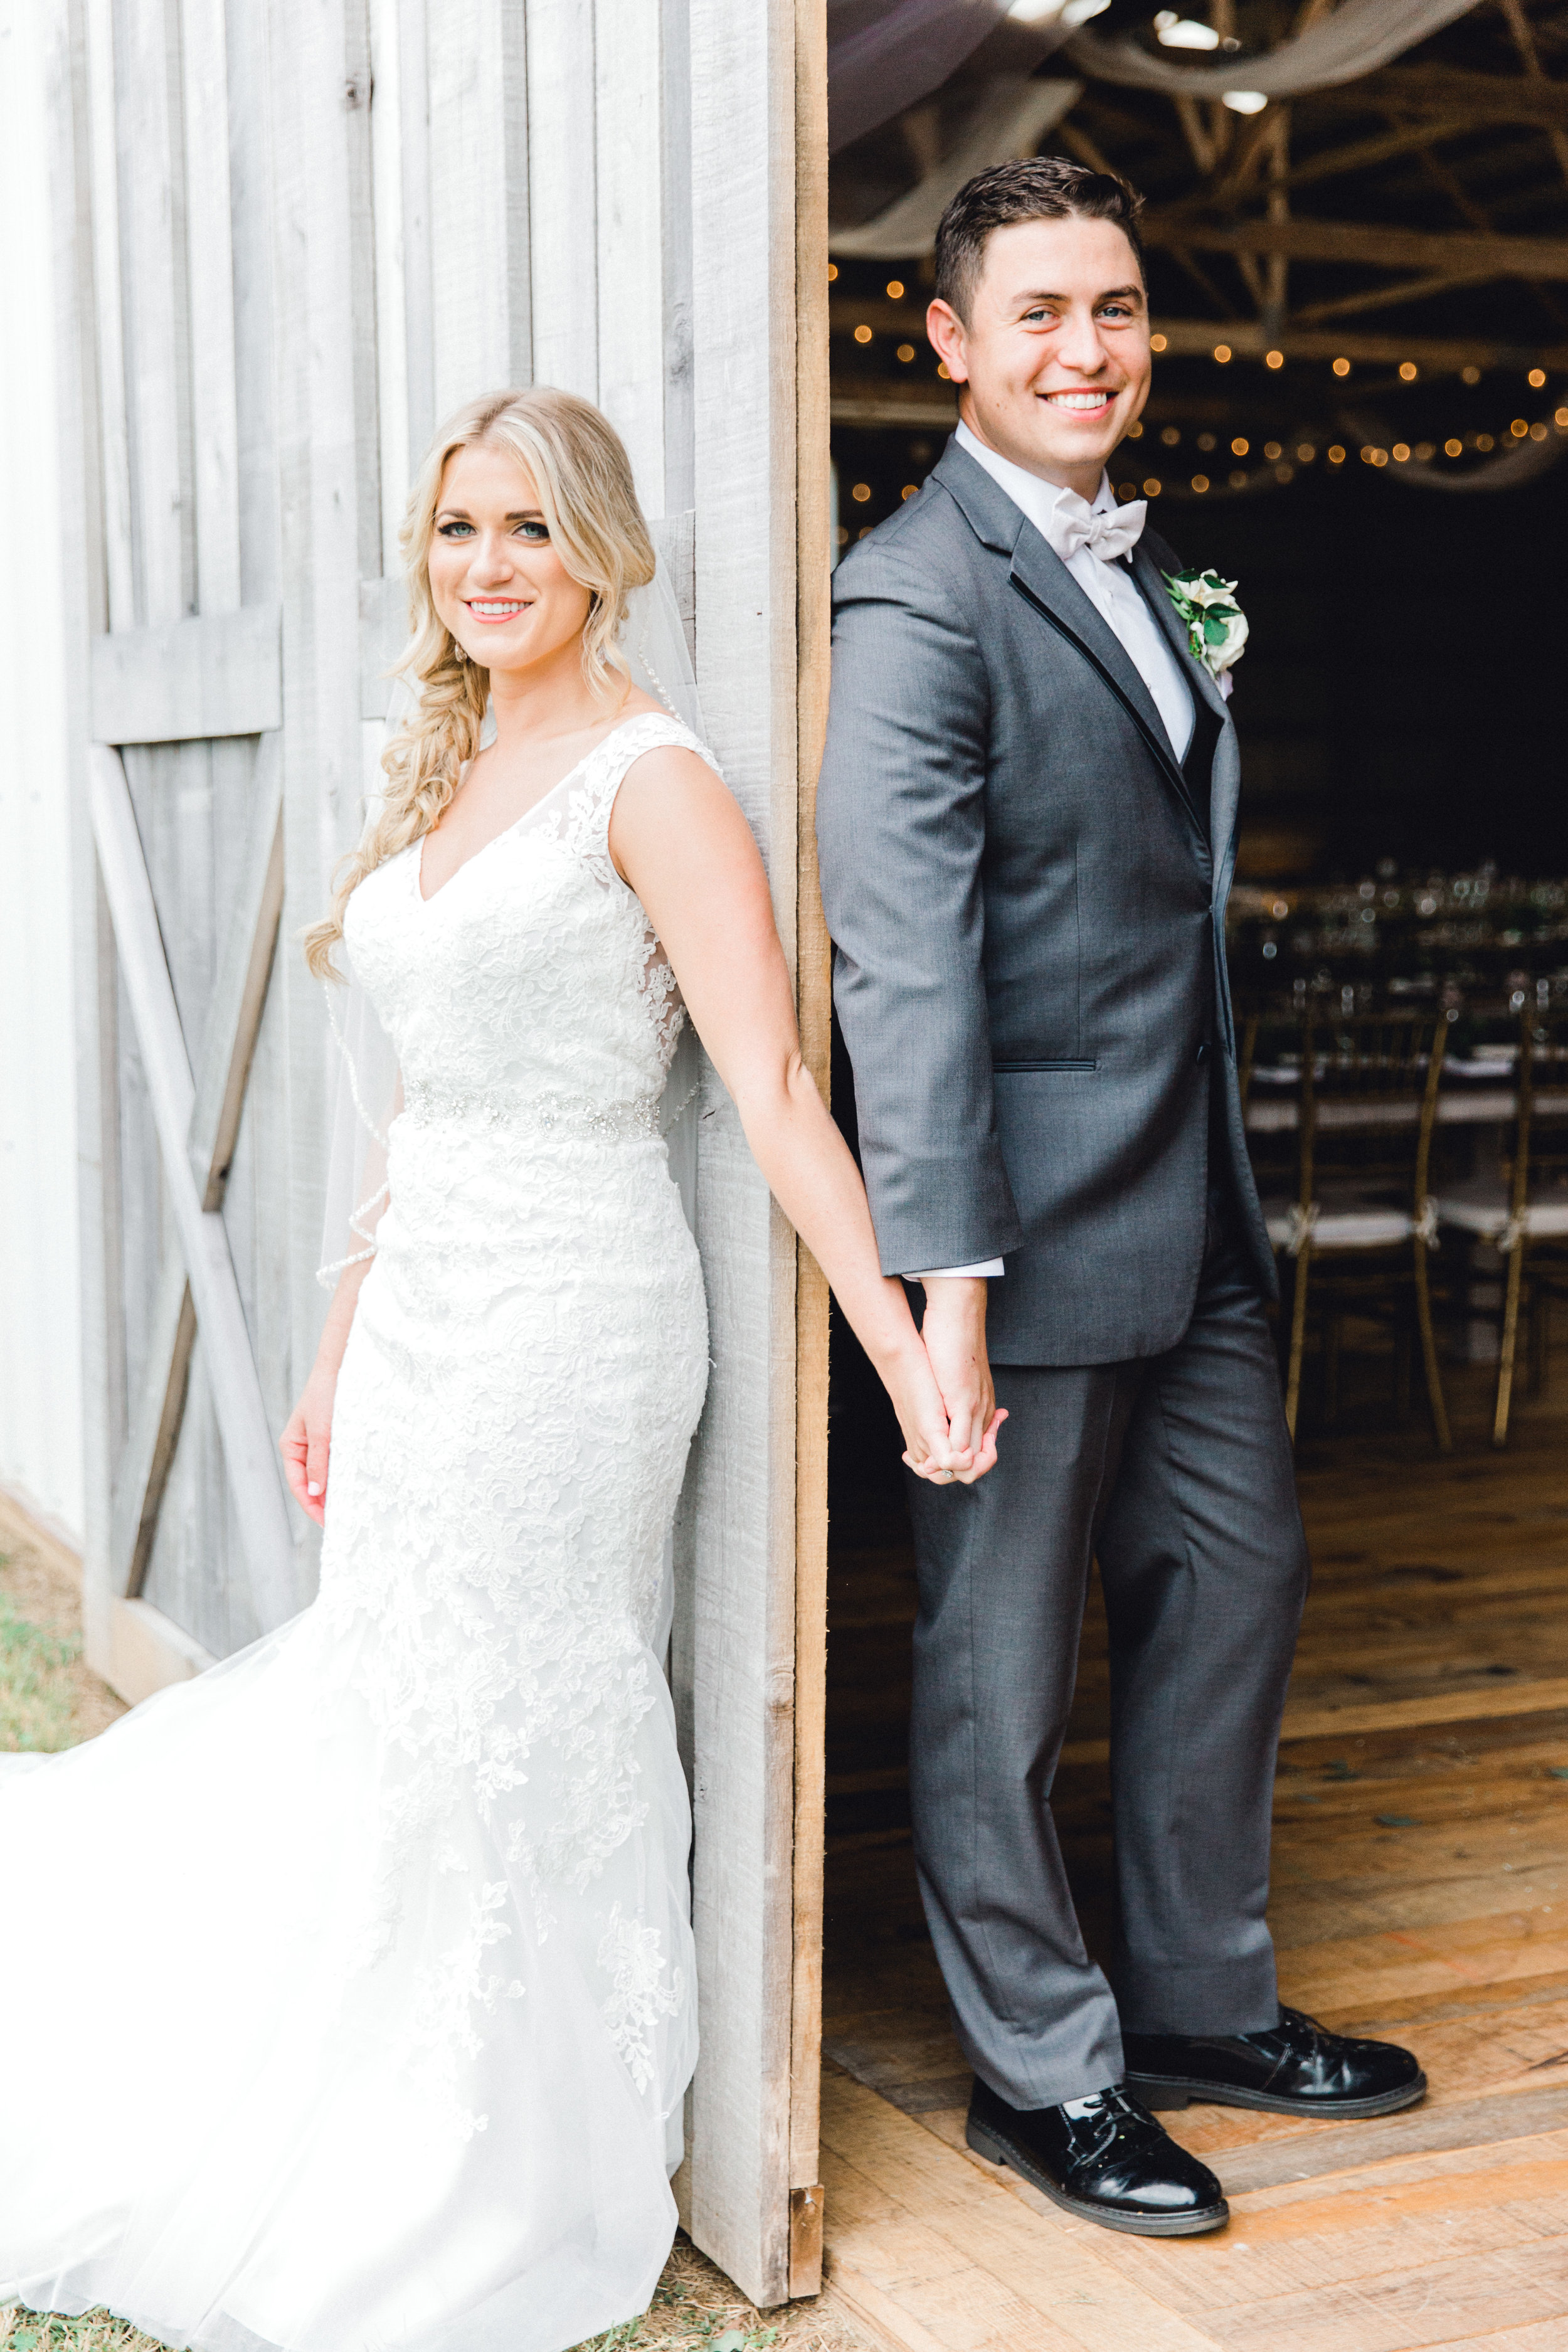 Paige-Mercer-Photography-Florida-Wedding-Photographer-Alyssa&Drew-41.jpg